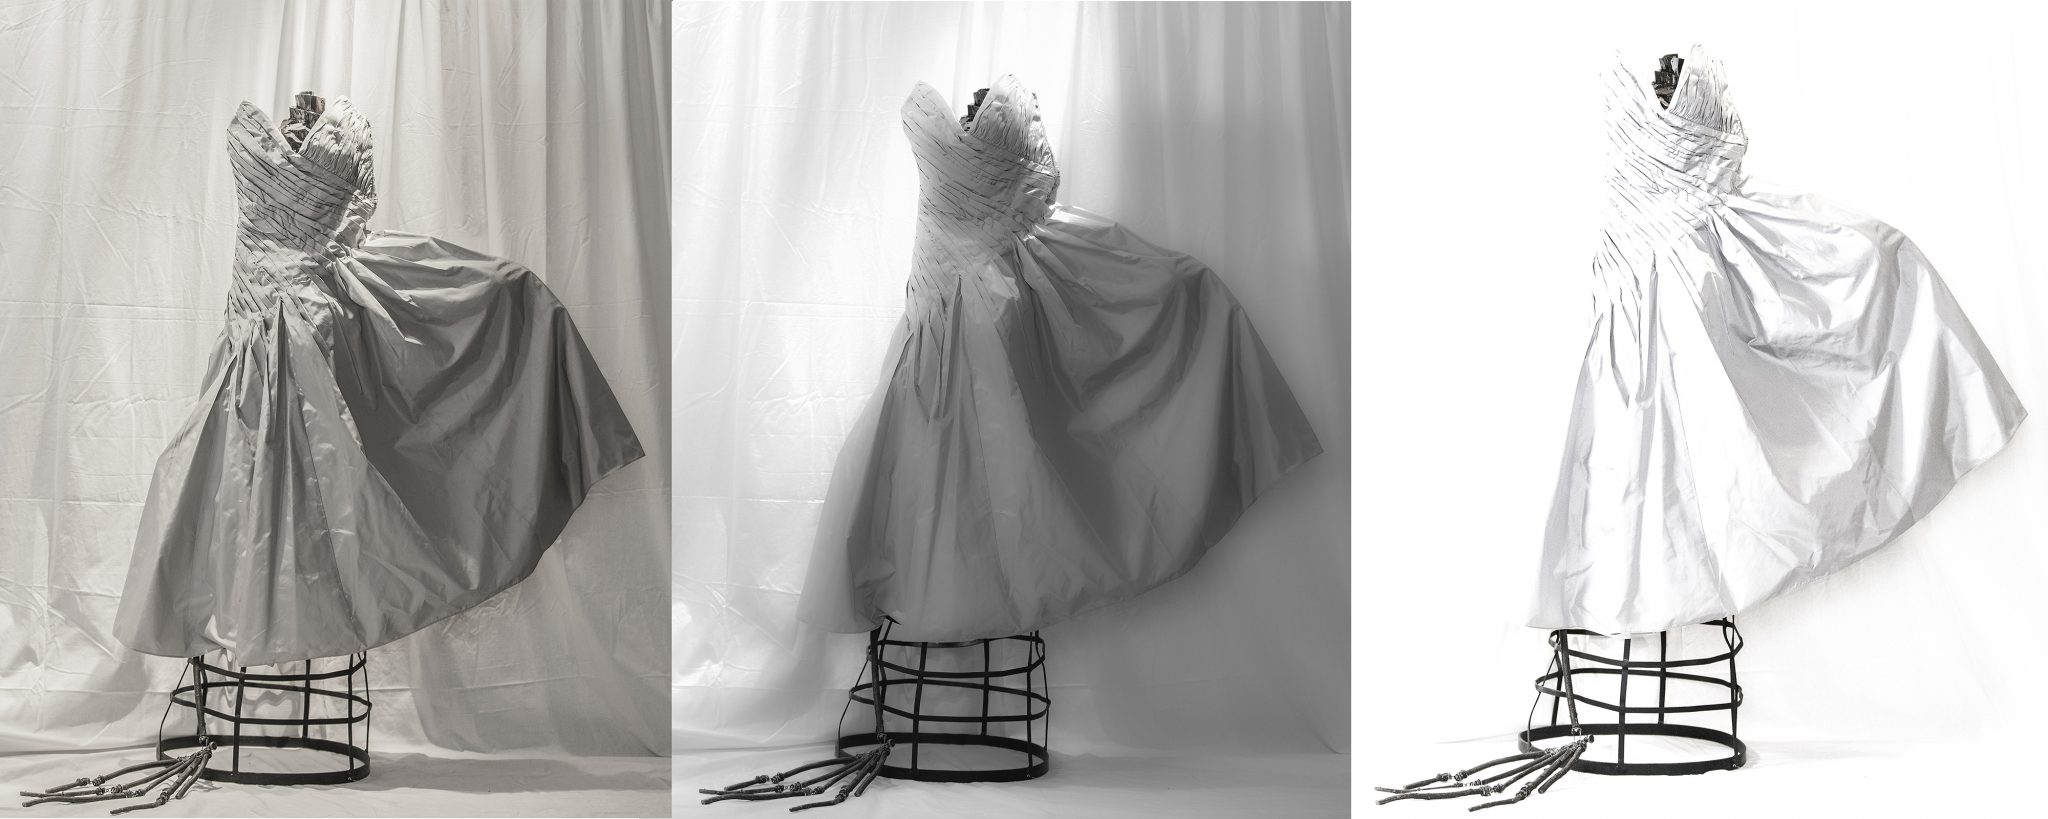 nora's dance triptych